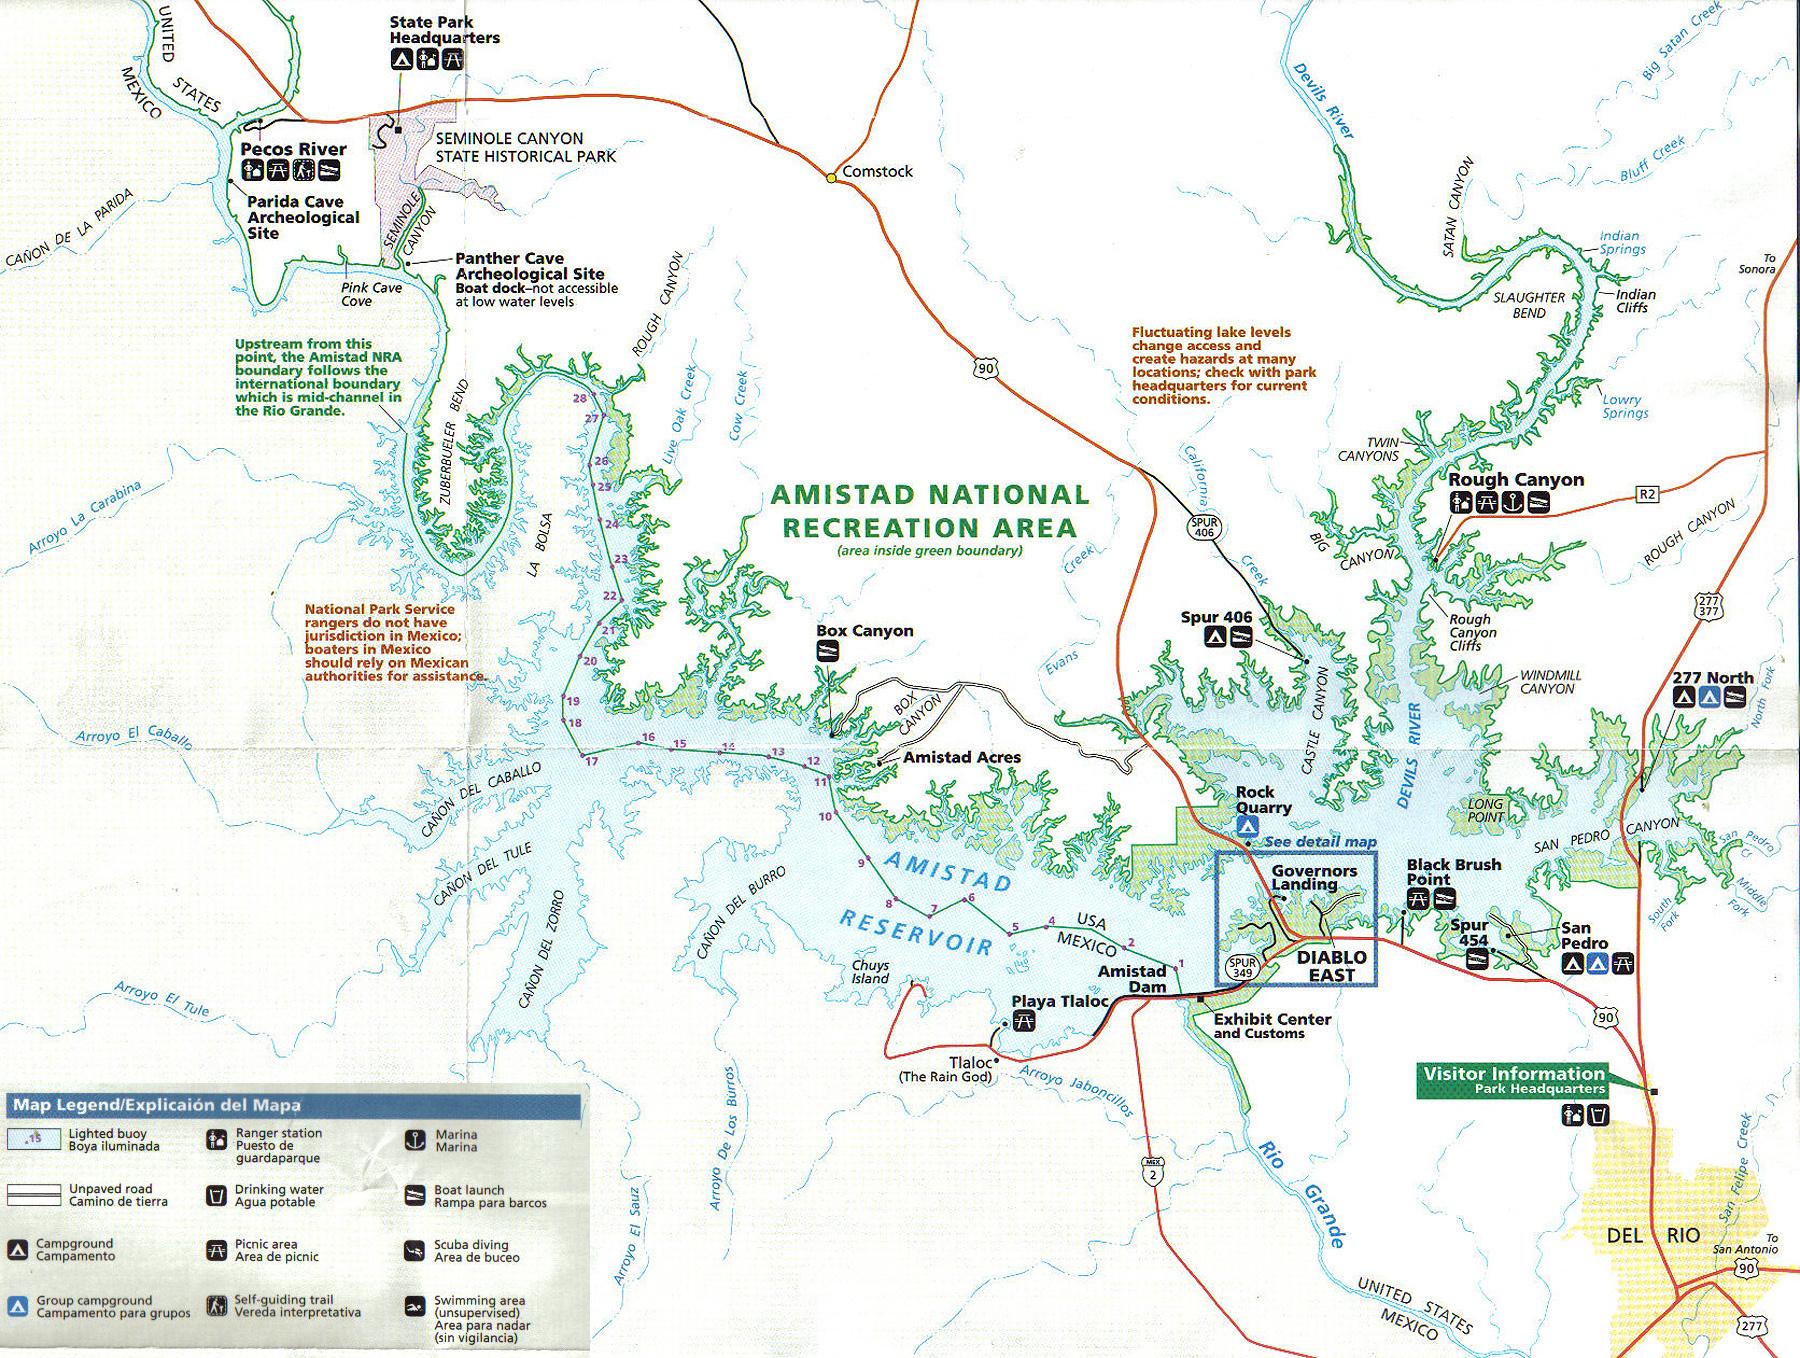 Lake Amistad Information Fishing Guide Kurt Dove - Top Spot Fishing Maps Texas